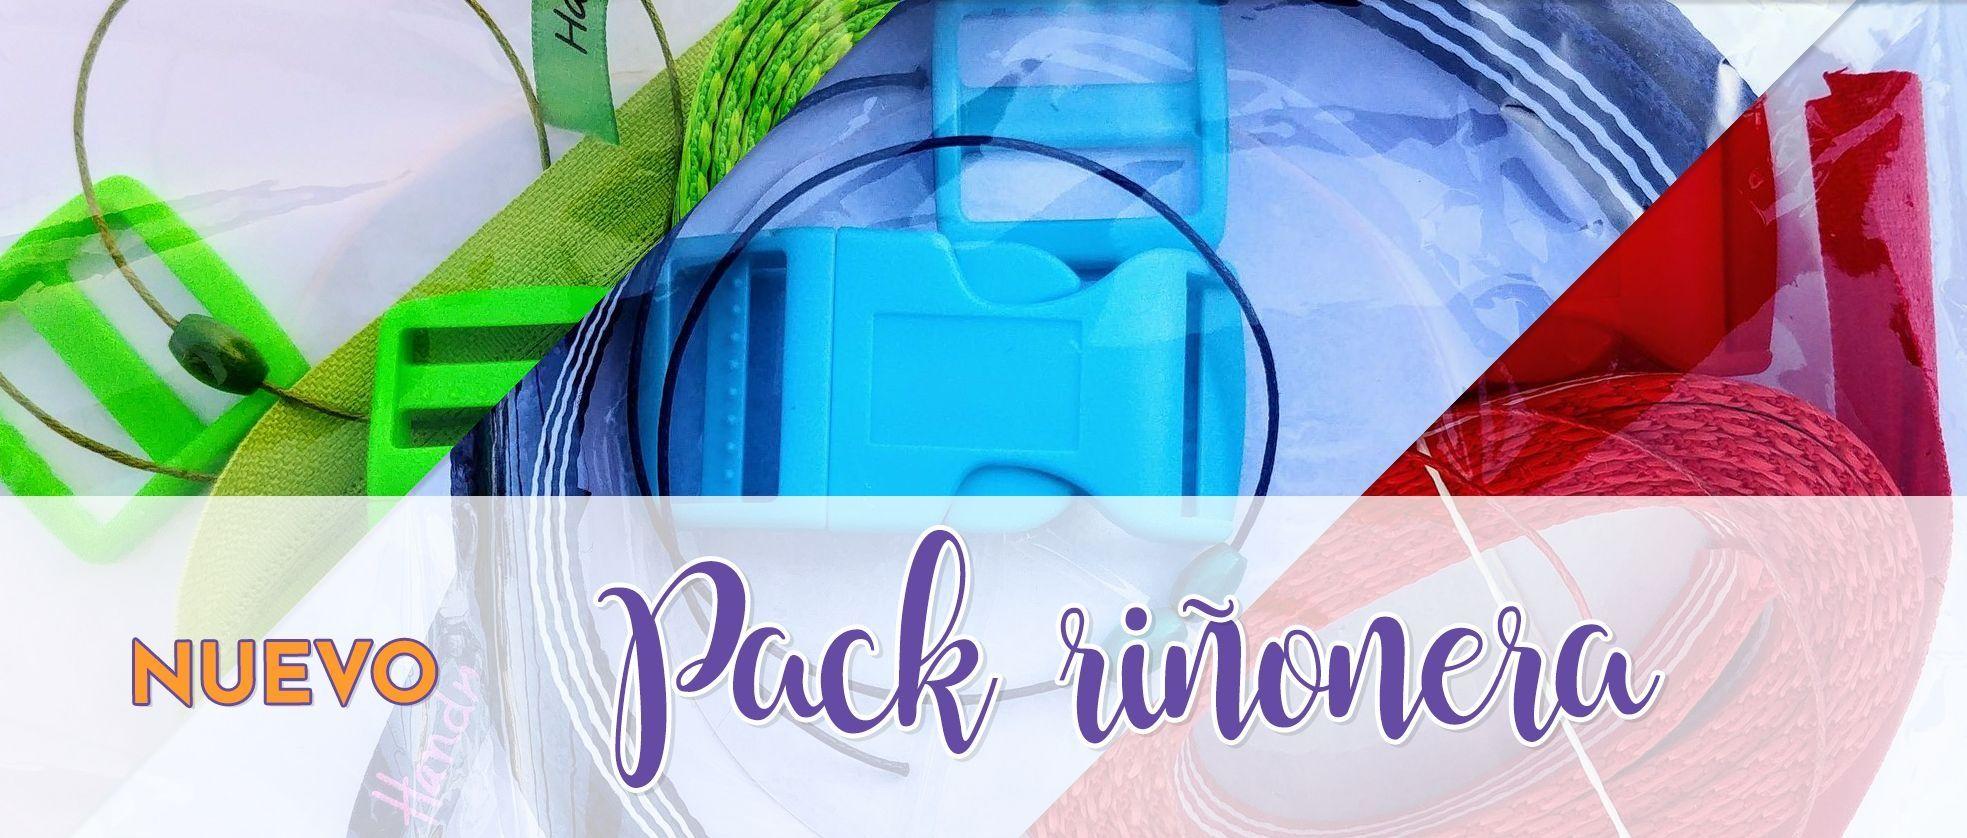 Pack riñonera